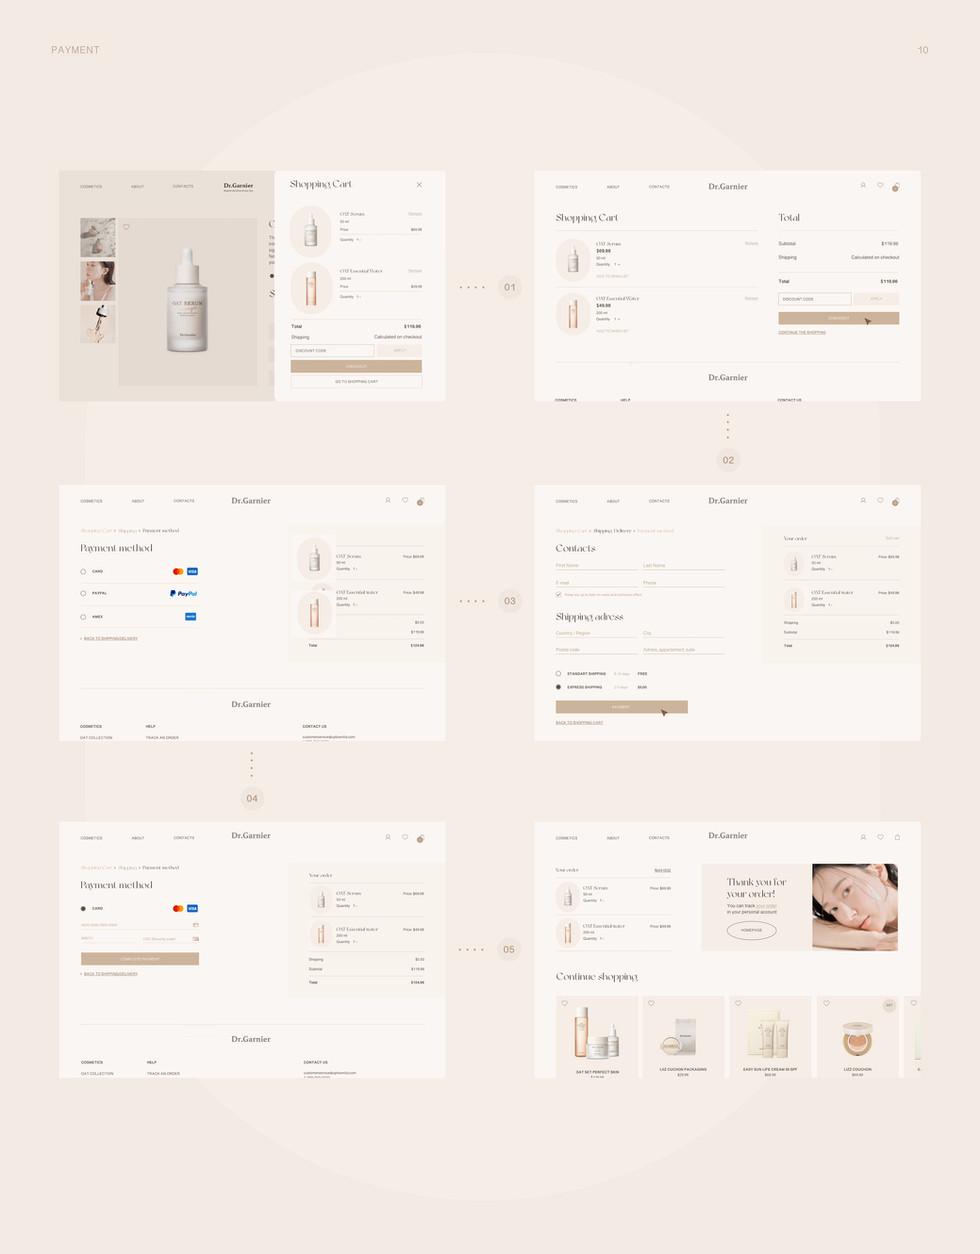 DR. Garnier Cosmetic Website Design6.jpg